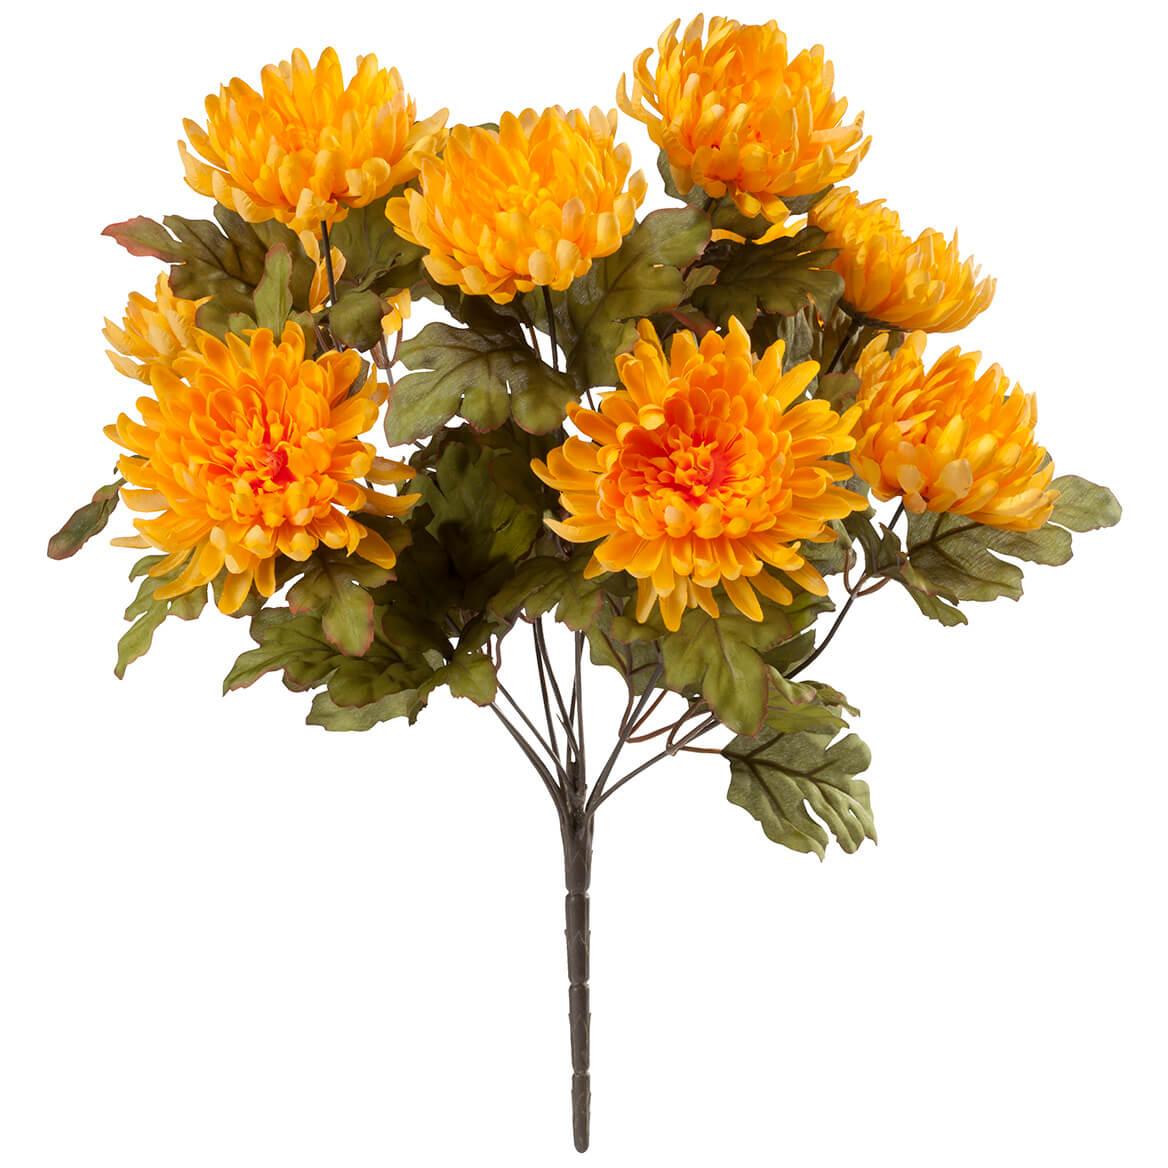 Yellow Artificial Mum Bush by OakRidge™ Silk Floral Décor